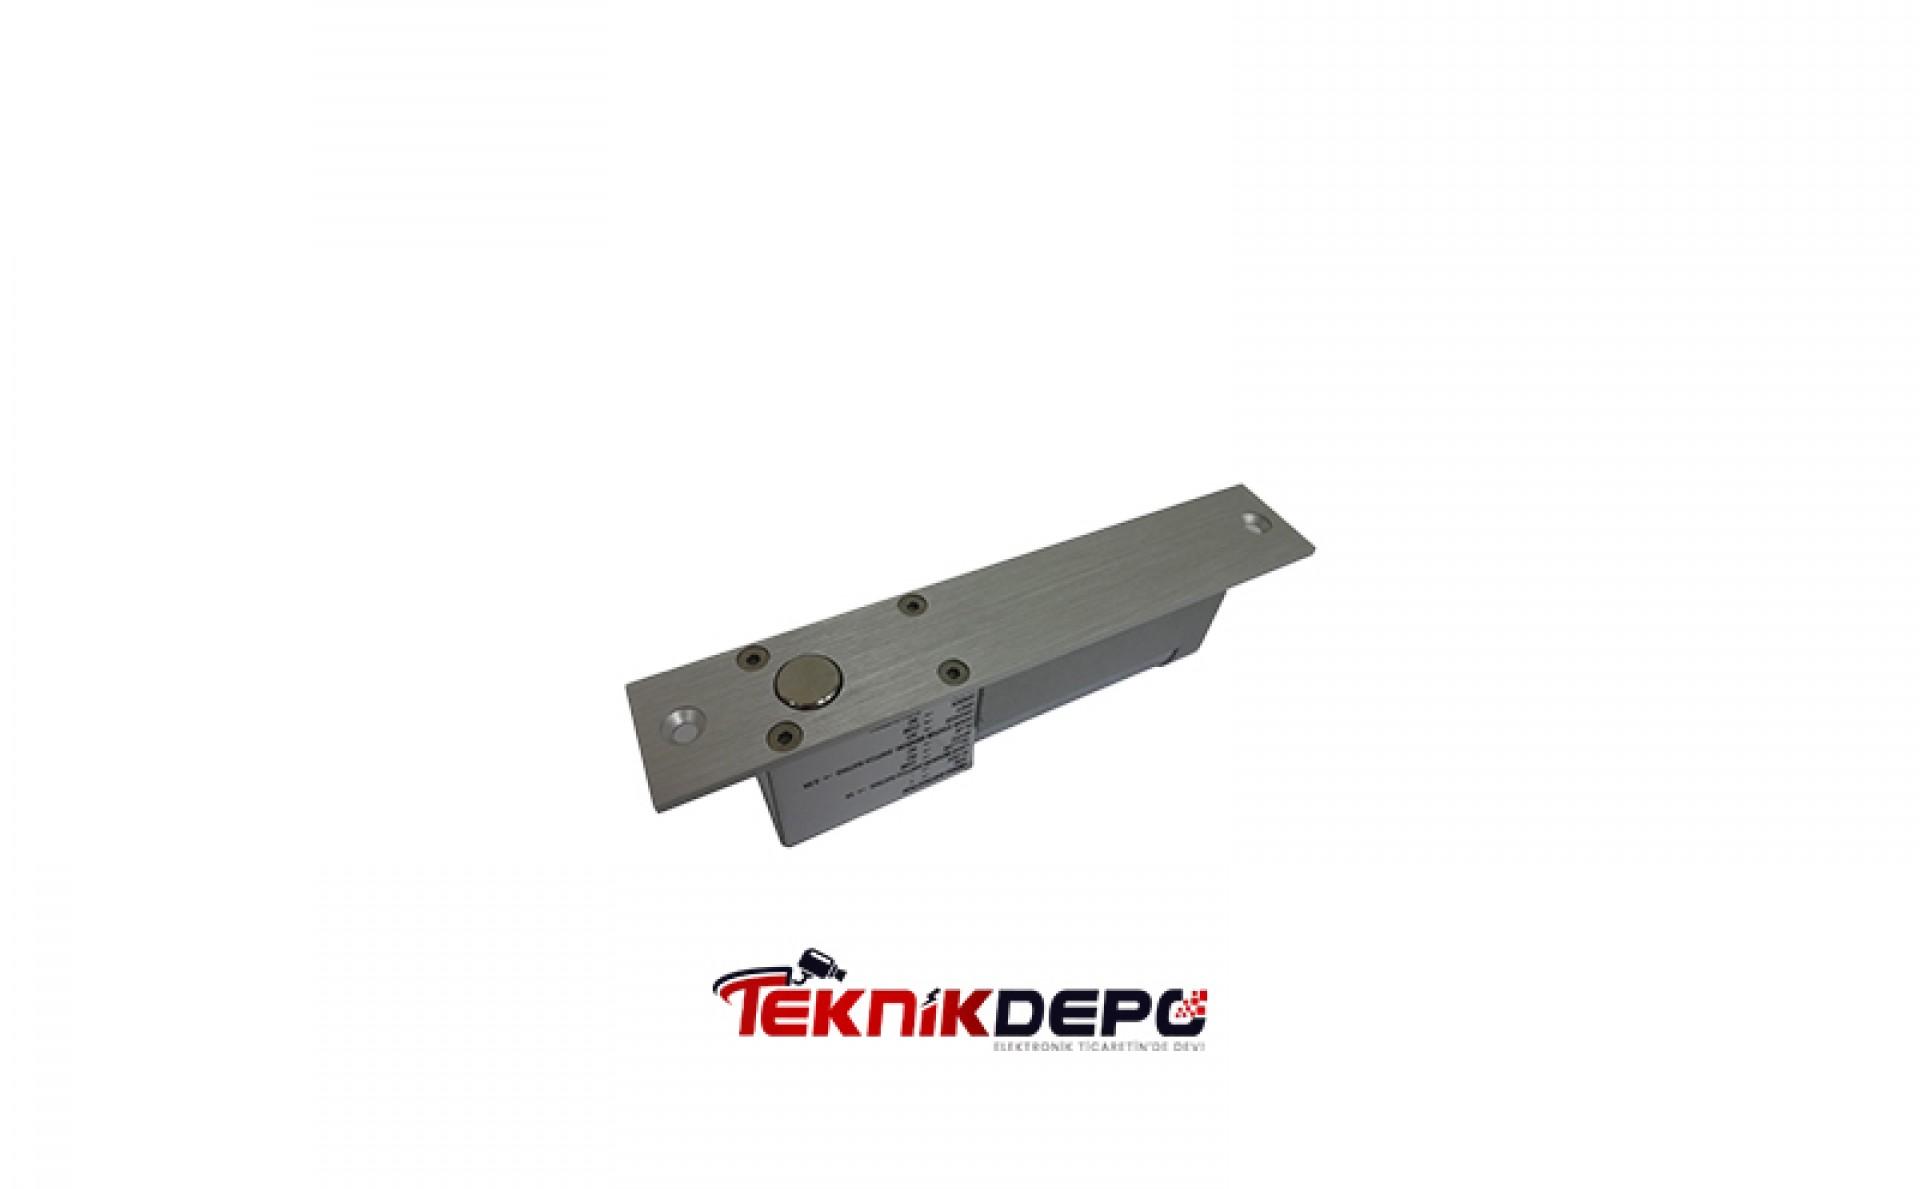 K280 P - Pimli Kapı Kilidi Karşılığı